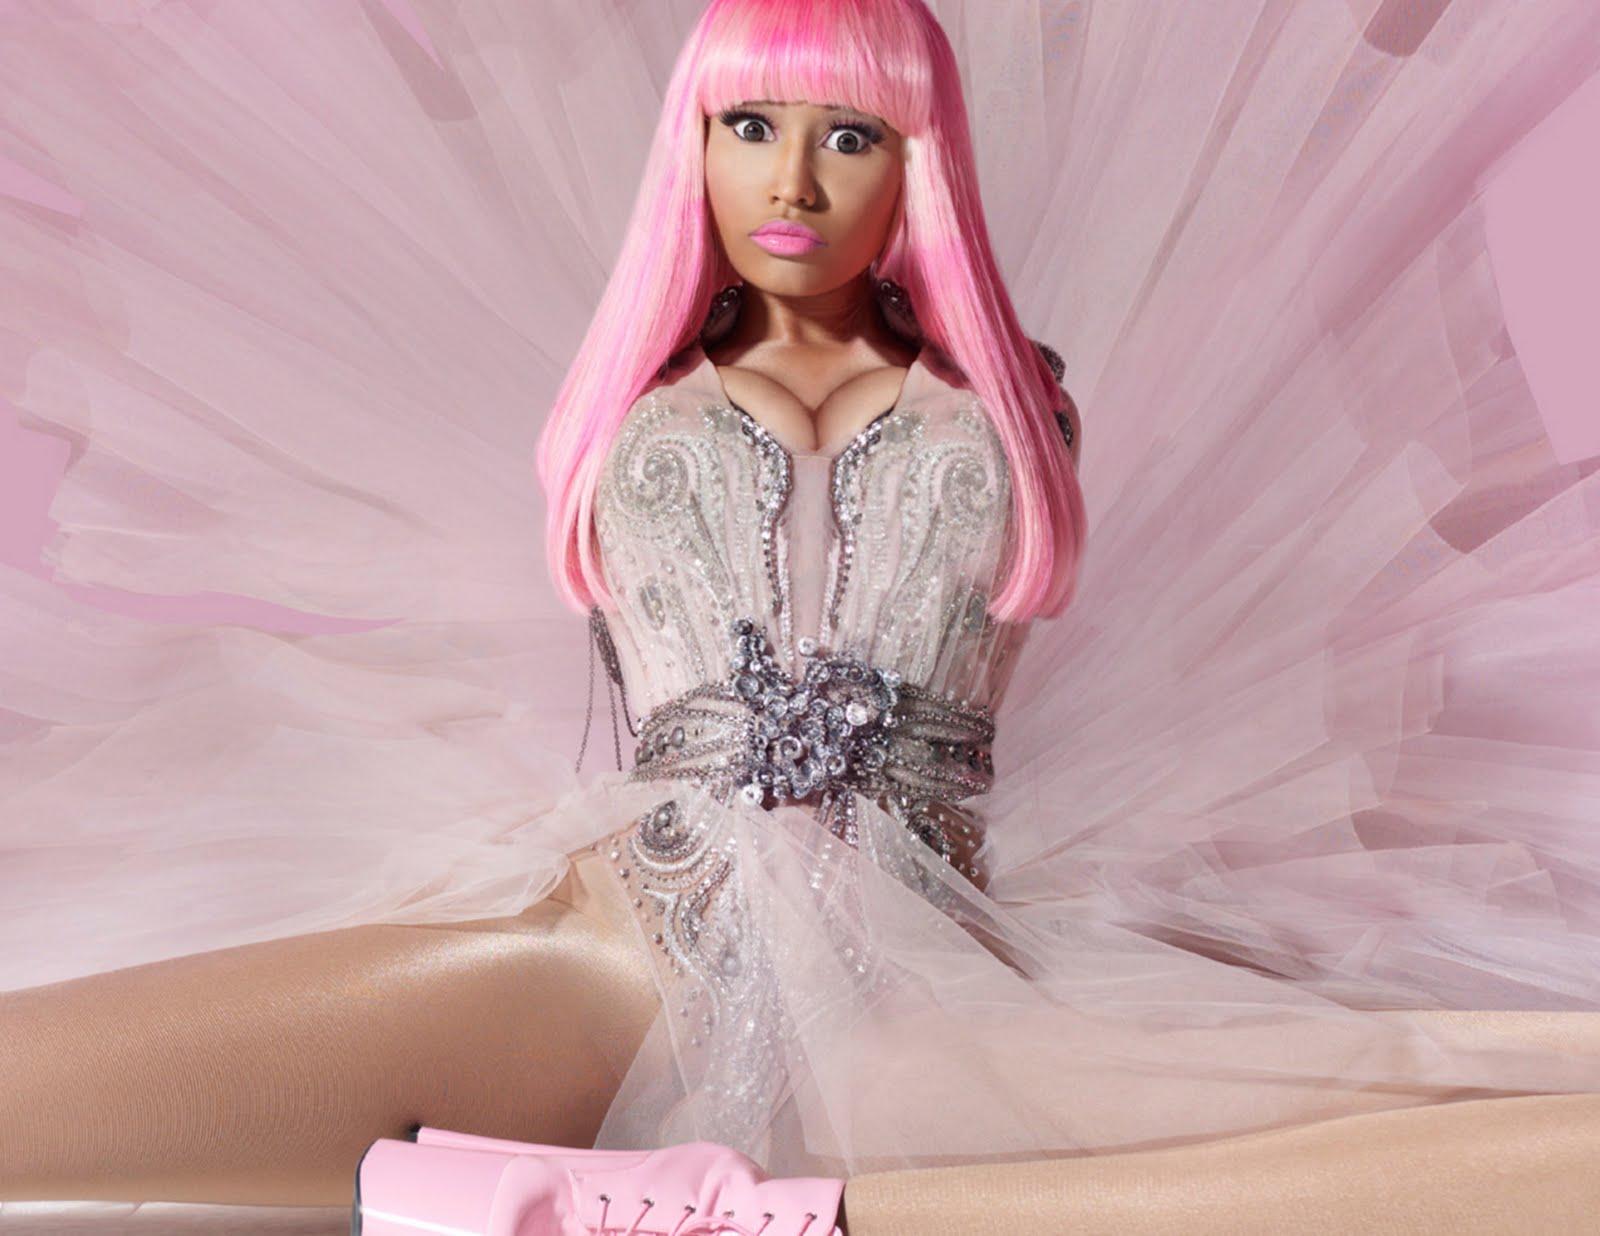 http://4.bp.blogspot.com/_PXvEQTUl8DY/TThCGVEfv3I/AAAAAAAAAHI/b3ihgORsNMc/s1600/M.A.C-Pink-Friday-Nicki-Minaj.jpg